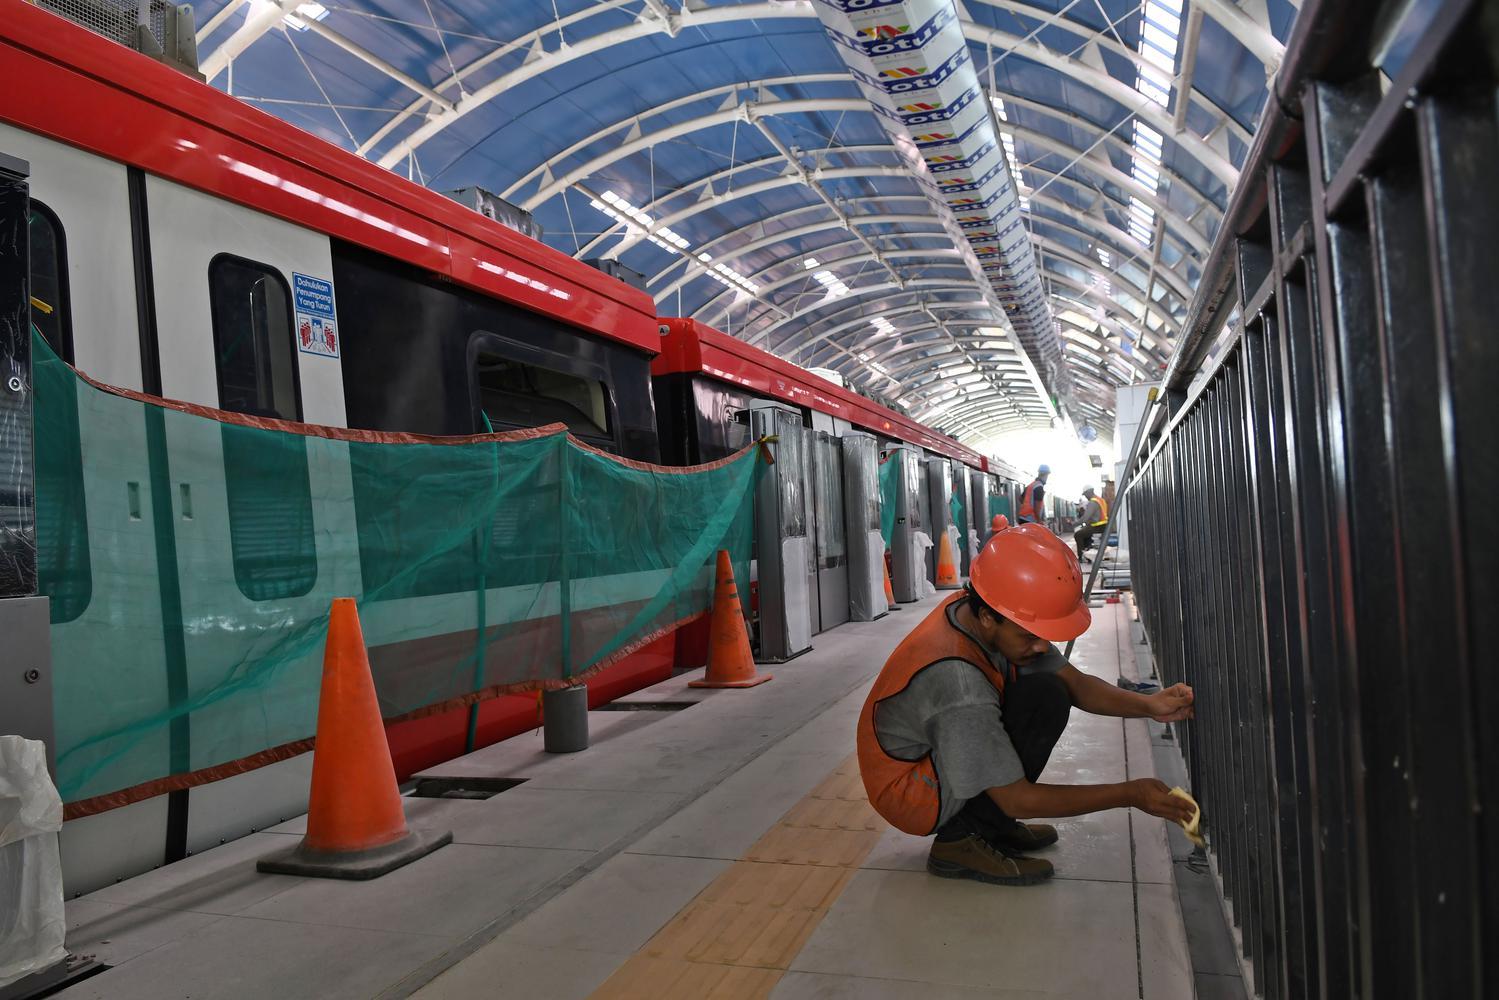 Pekerja mengerjakan pembangunan pagar pembatas di Stasiun kereta 'light rail train' atau lintas rel terpadu (LRT) Harjamukti, Cimanggis, Kota Depok, Jawa Barat, Rabu (4/12/2019).